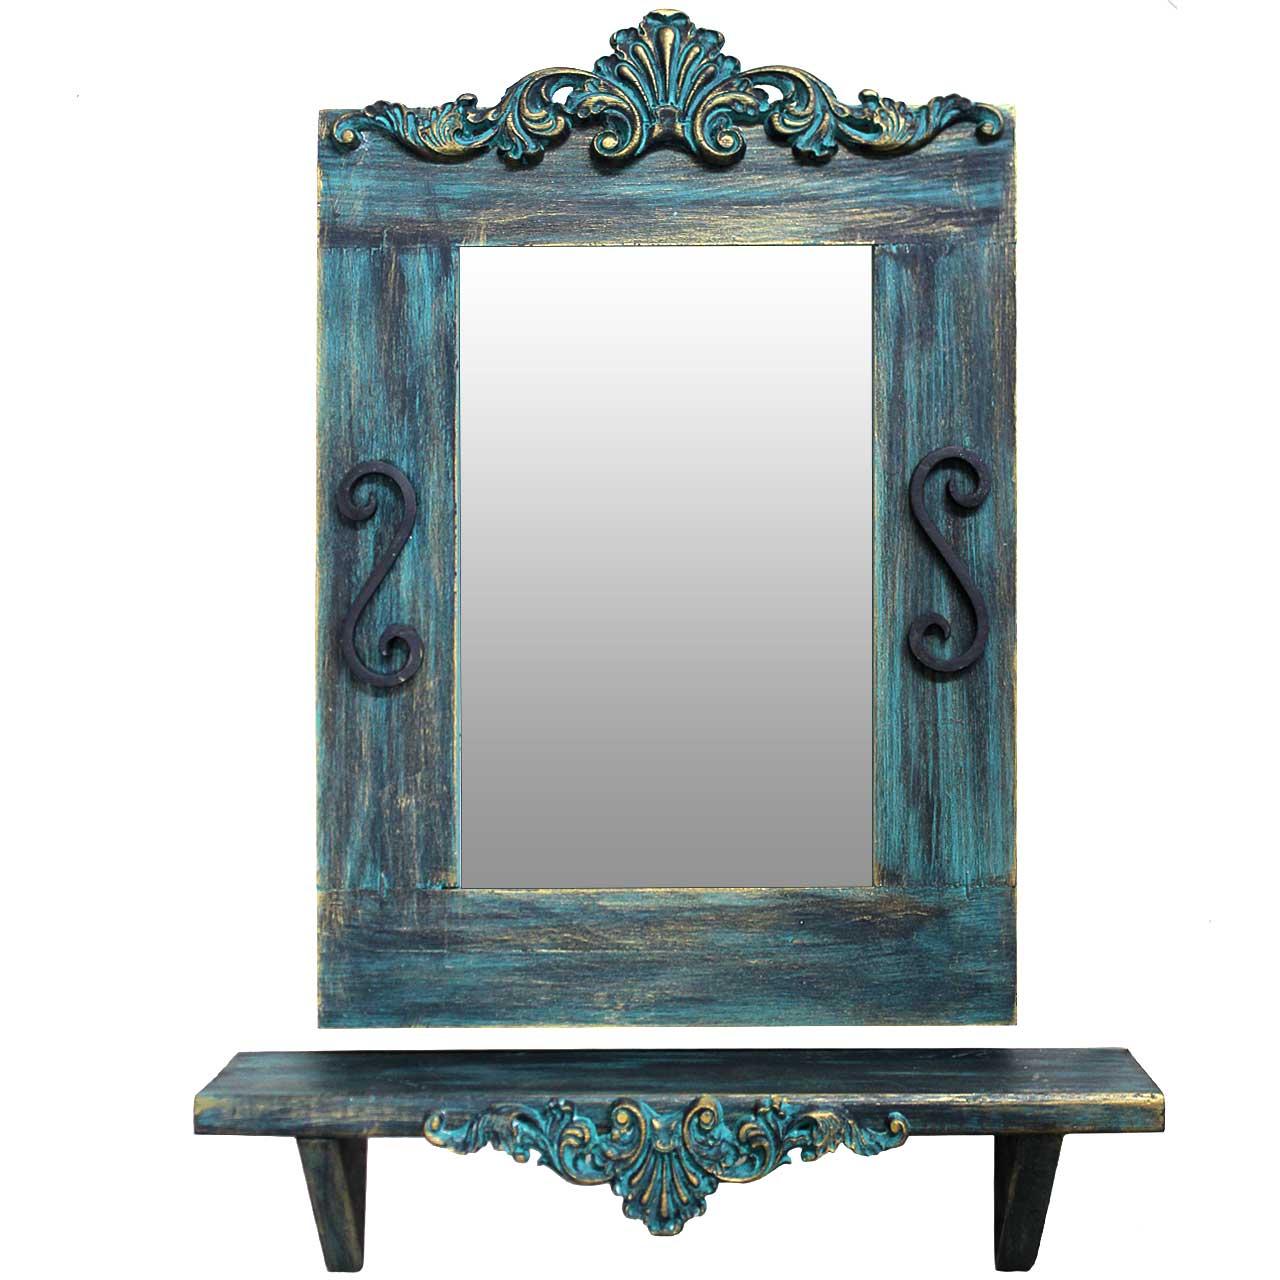 آینه و کنسول دست نگار کد 03-20